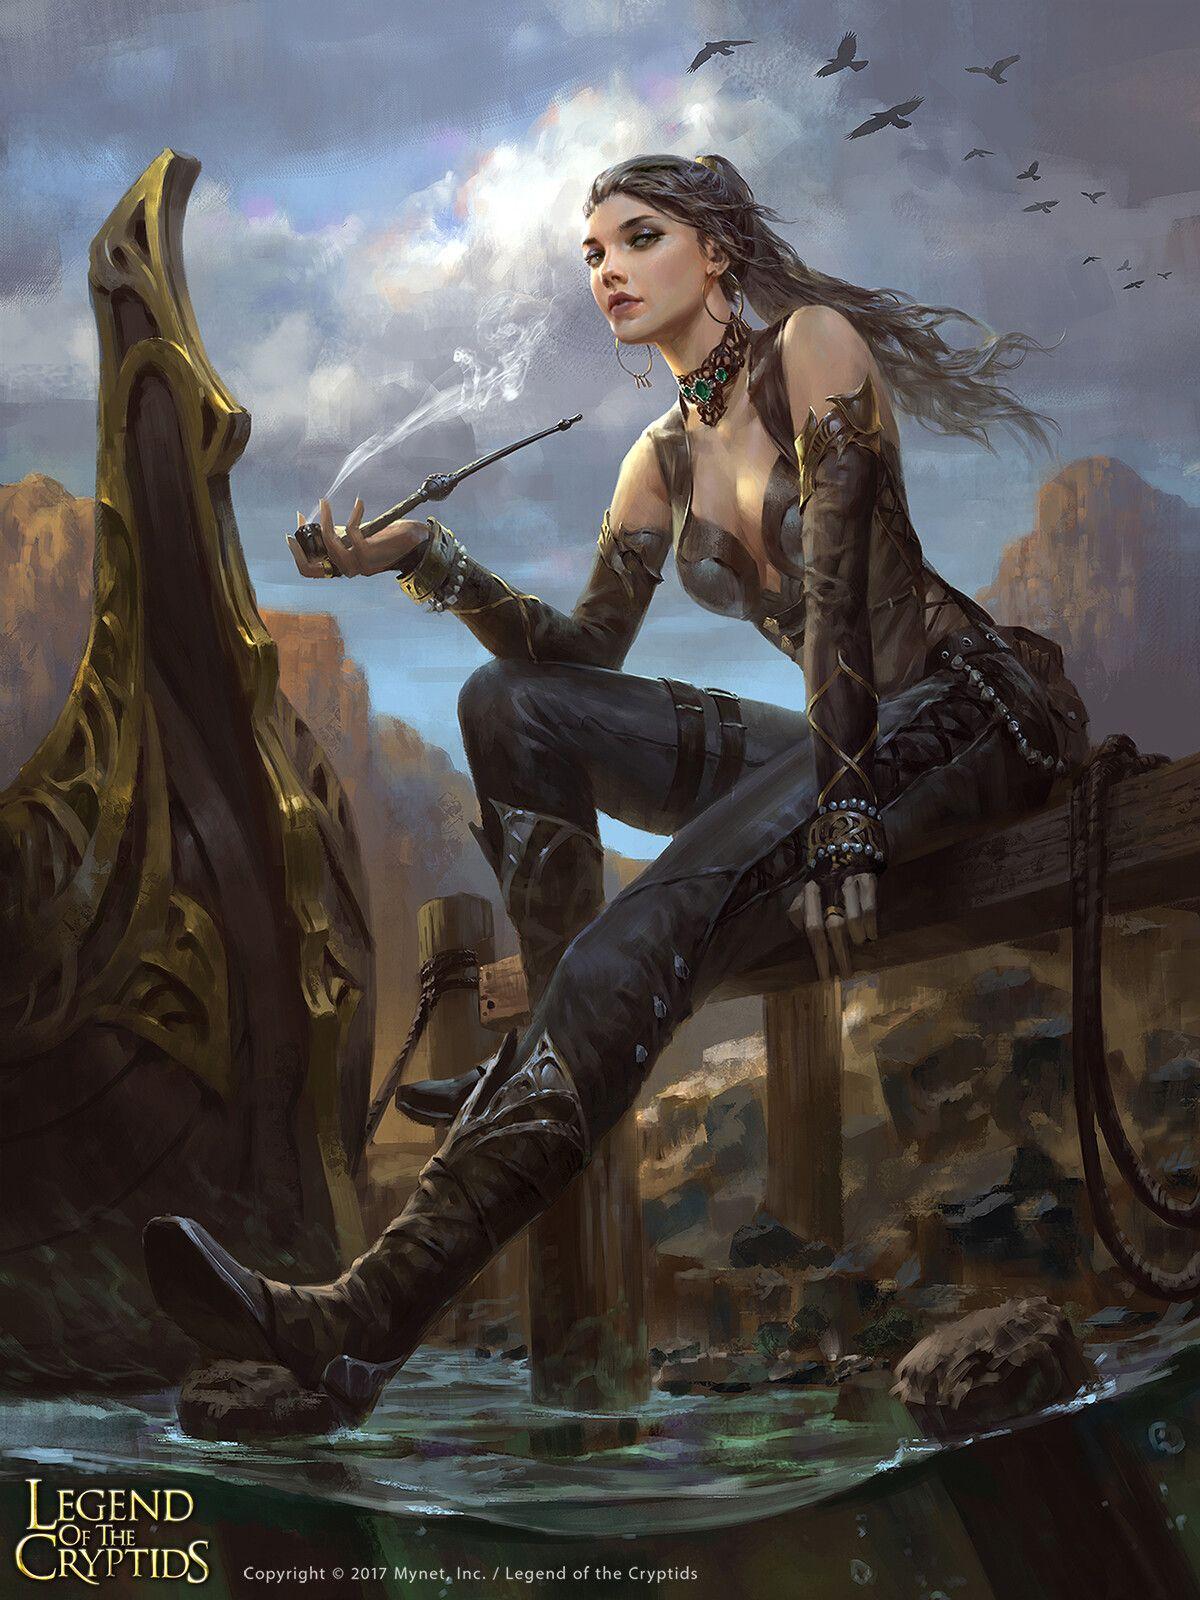 Ruins Paddler Sastiva By Wisnu Tan With Images Fantasy Art Women